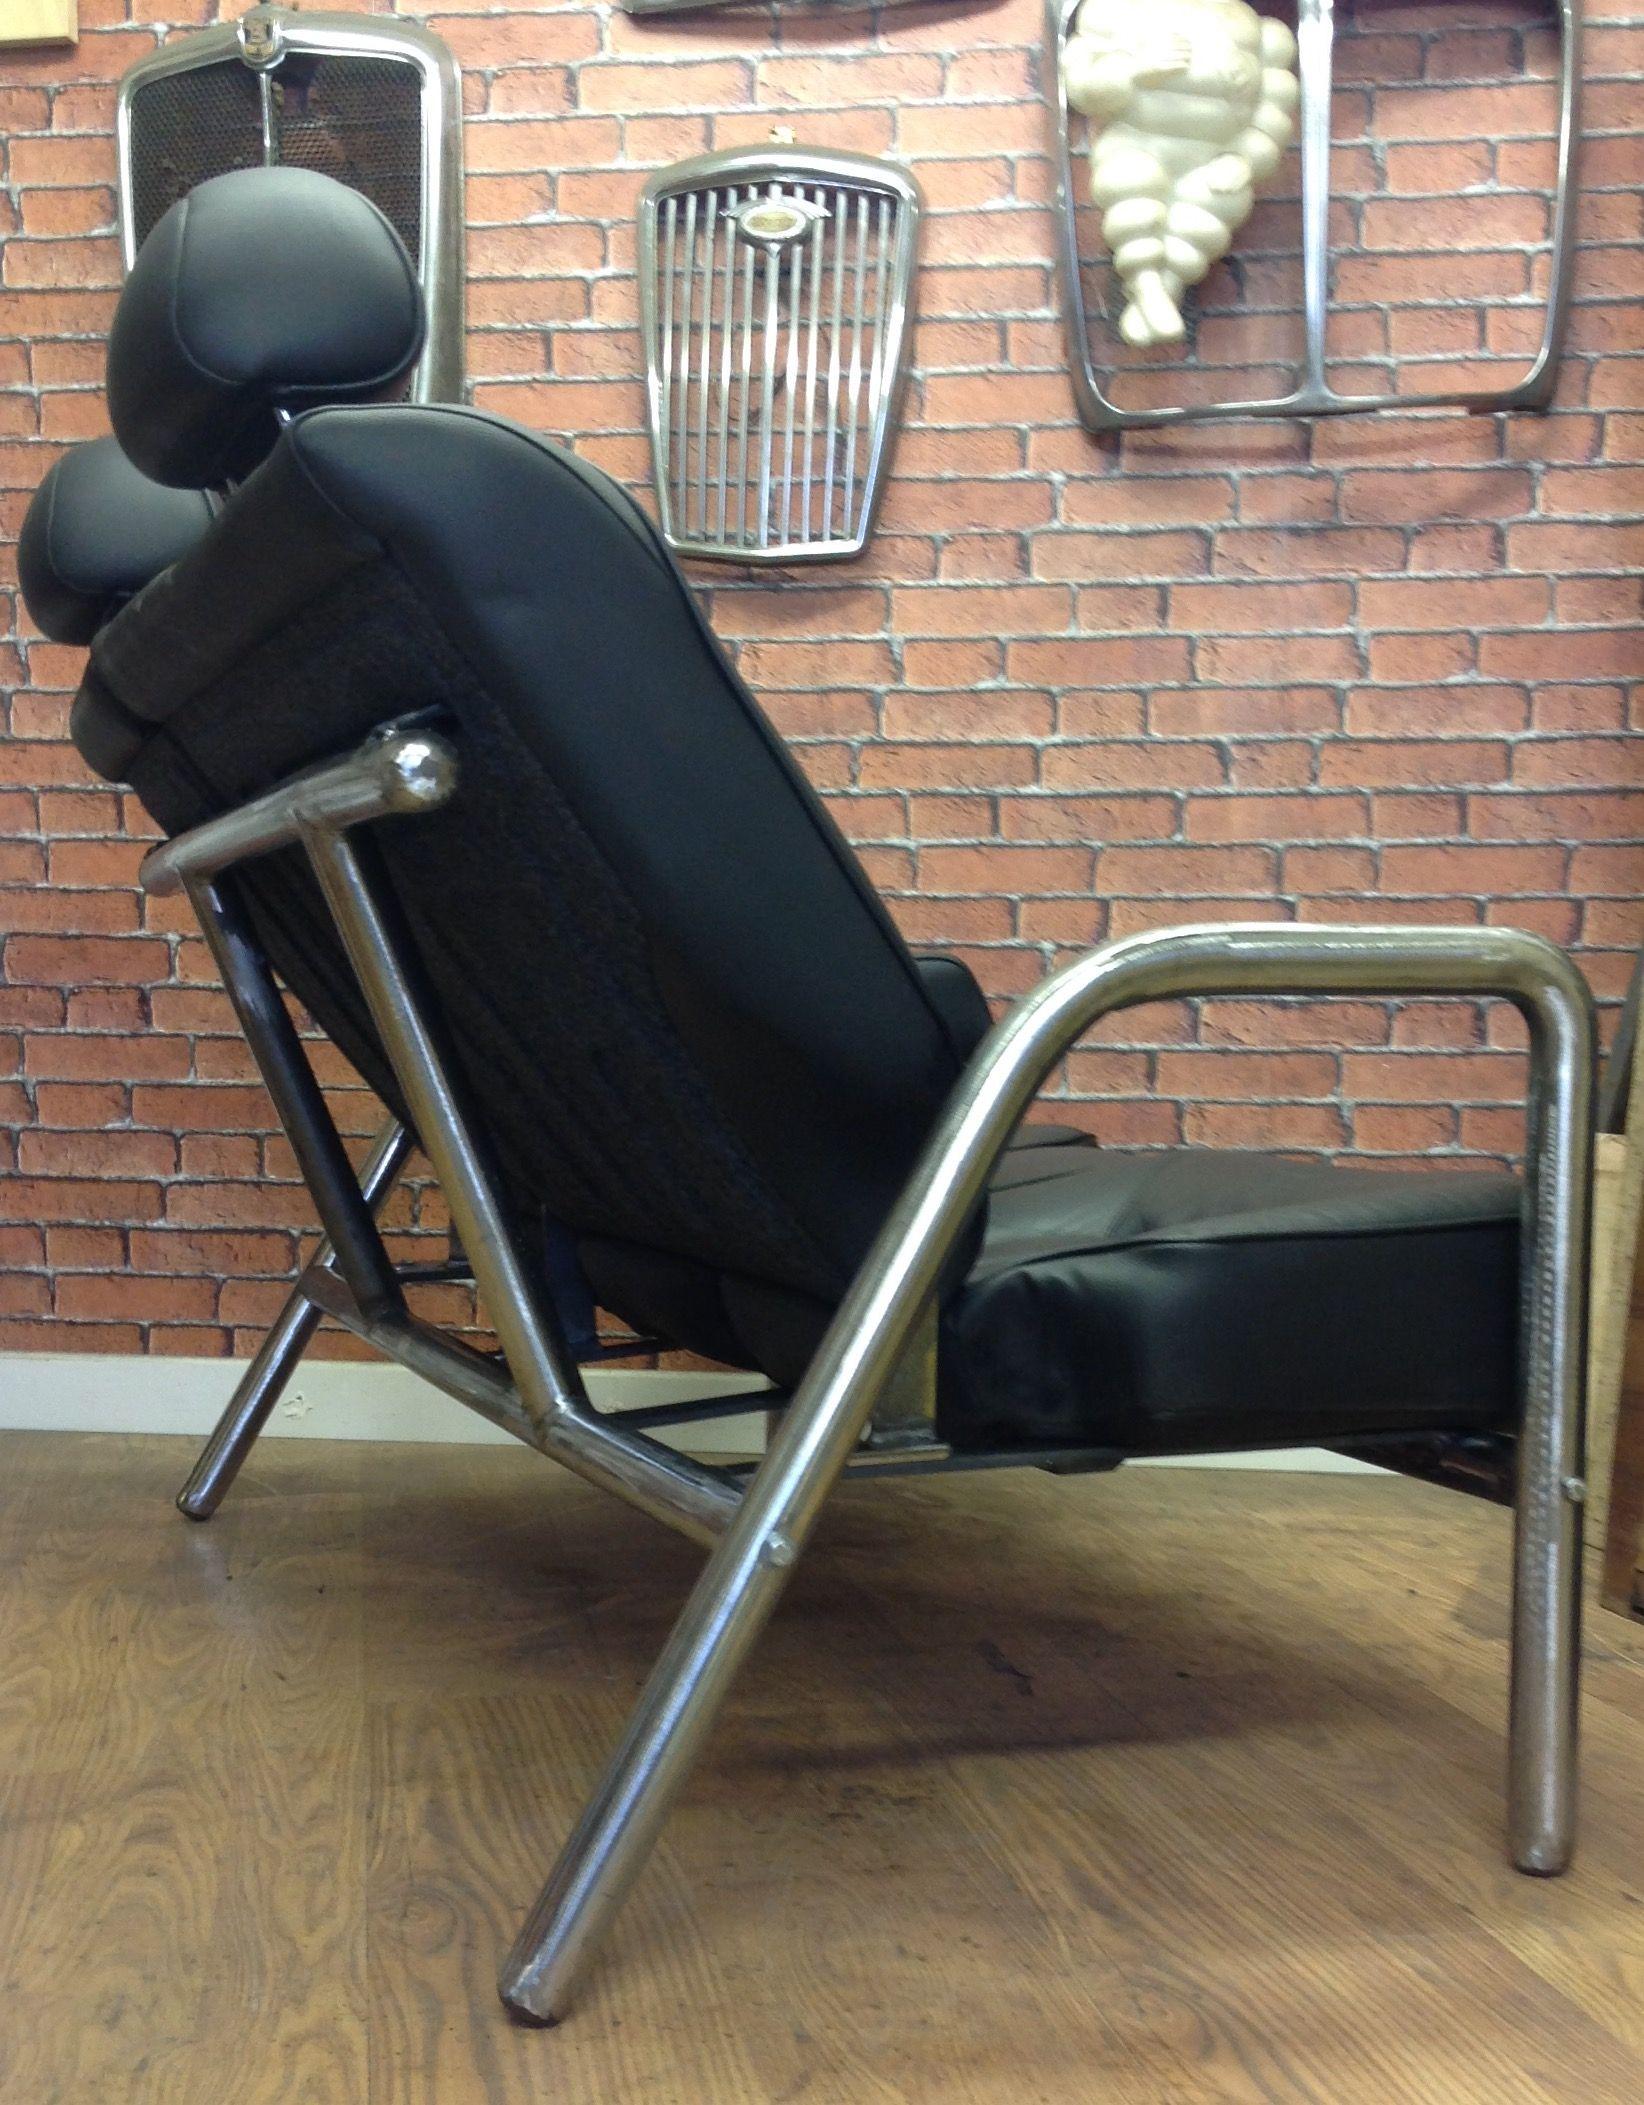 cars sofa chair sleepers dallas texas rover mofa rear car seat loft style